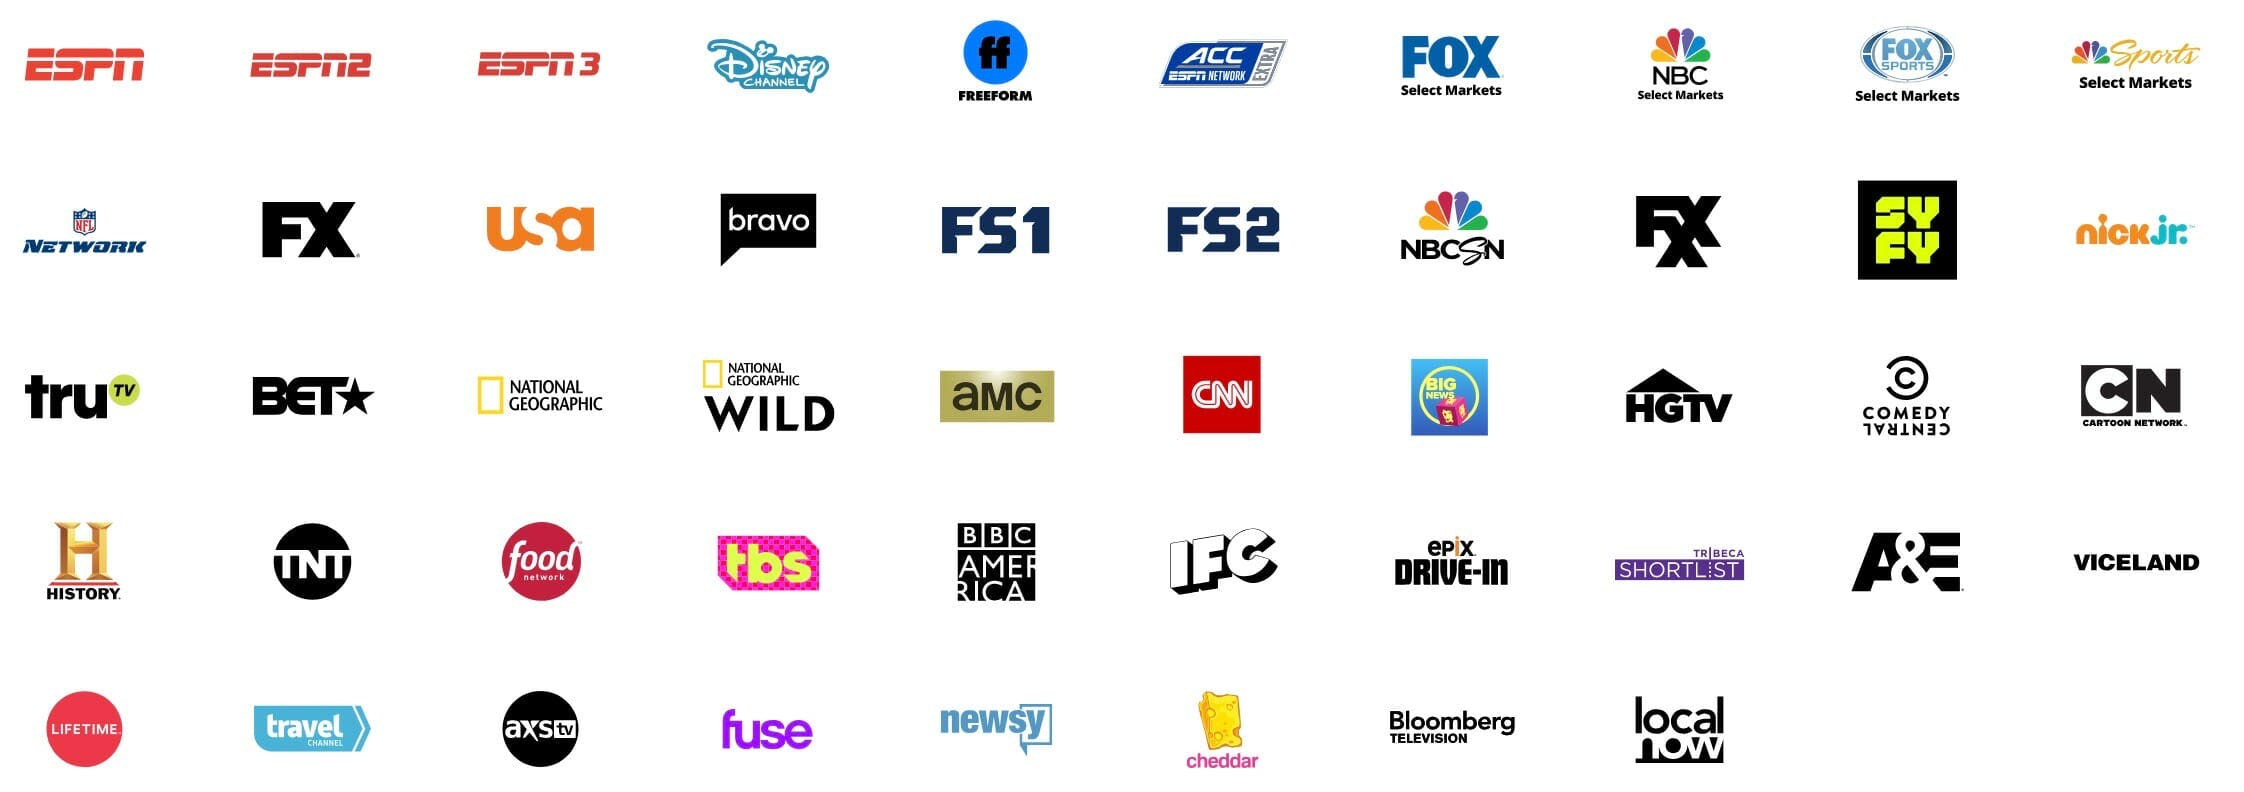 stream nfl games today on tv week 16 - sling orange + blue